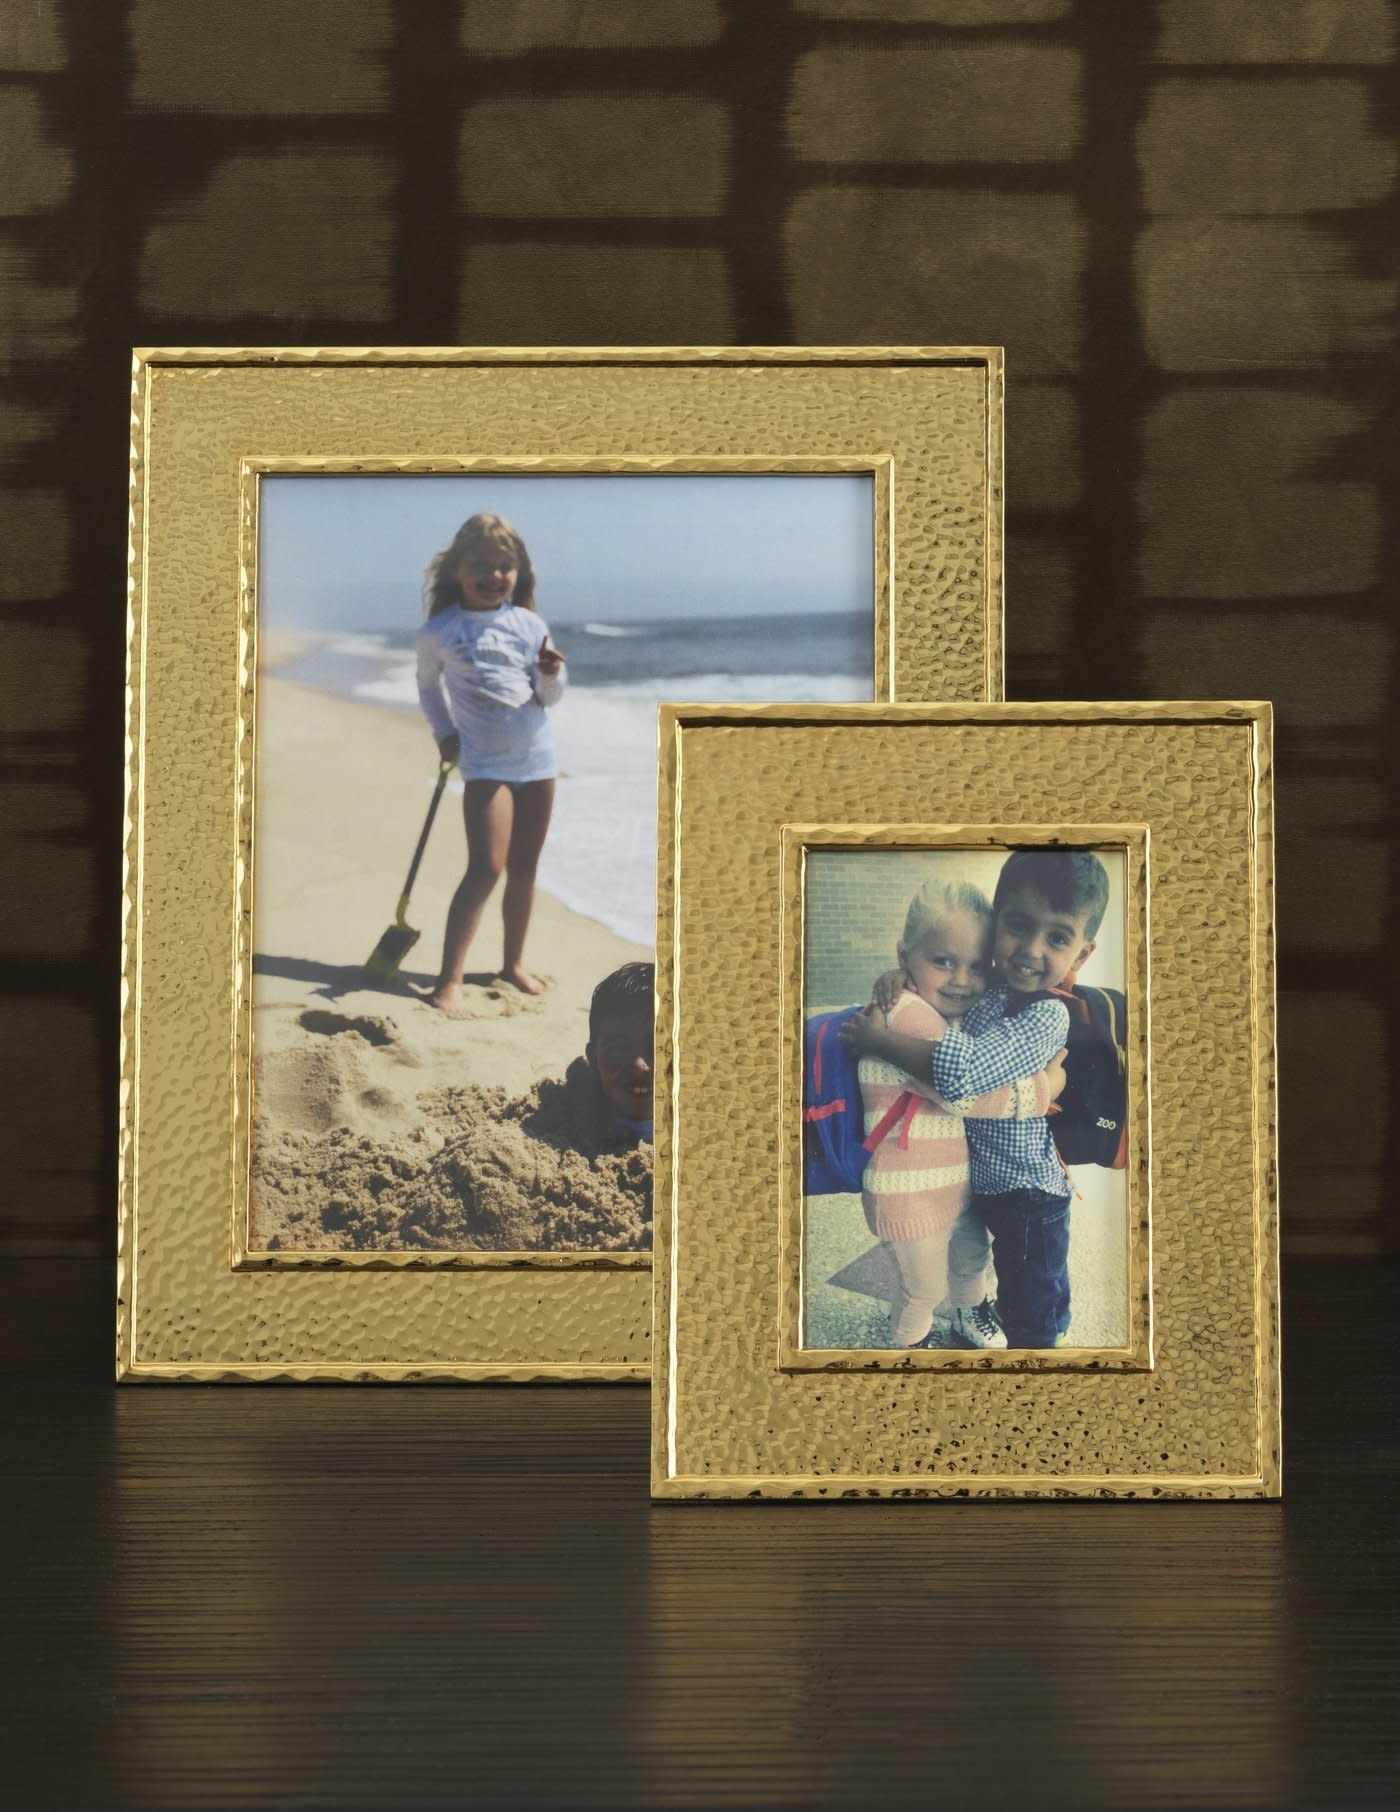 Hammertone Gold Photo Frame 20x25cm-5